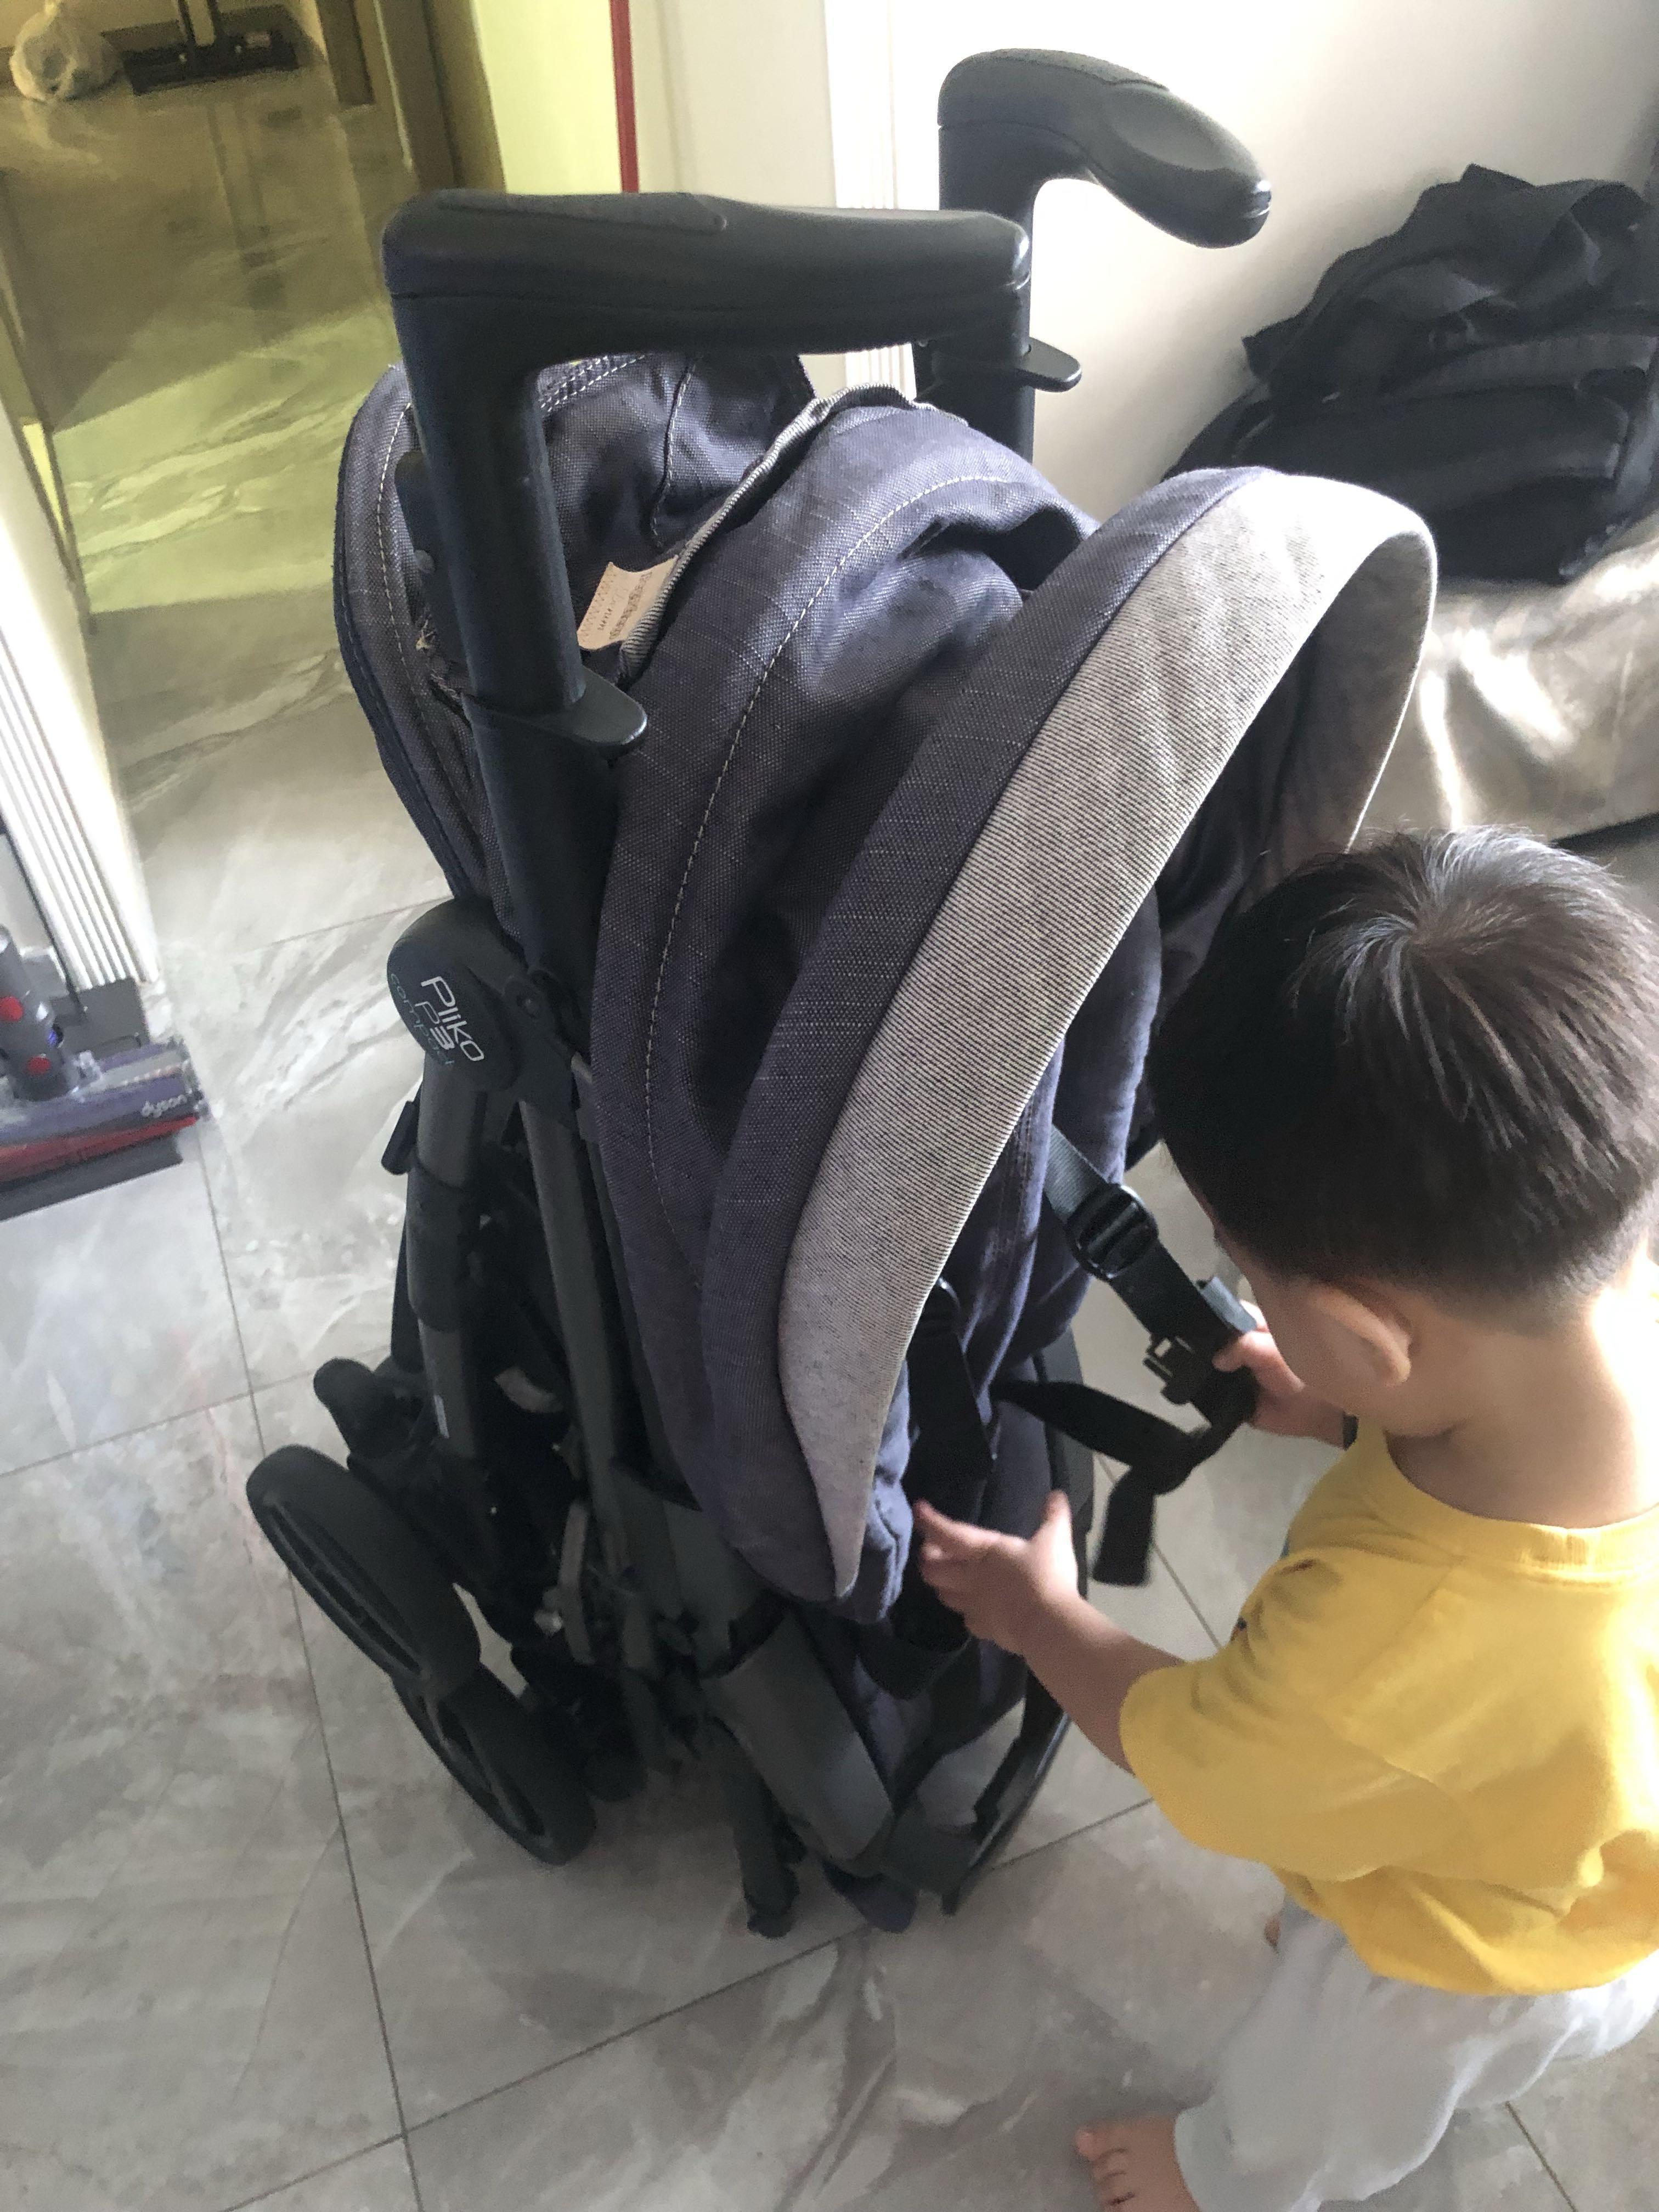 嬰兒車 、BB車、Peg-Perego P3 baby car